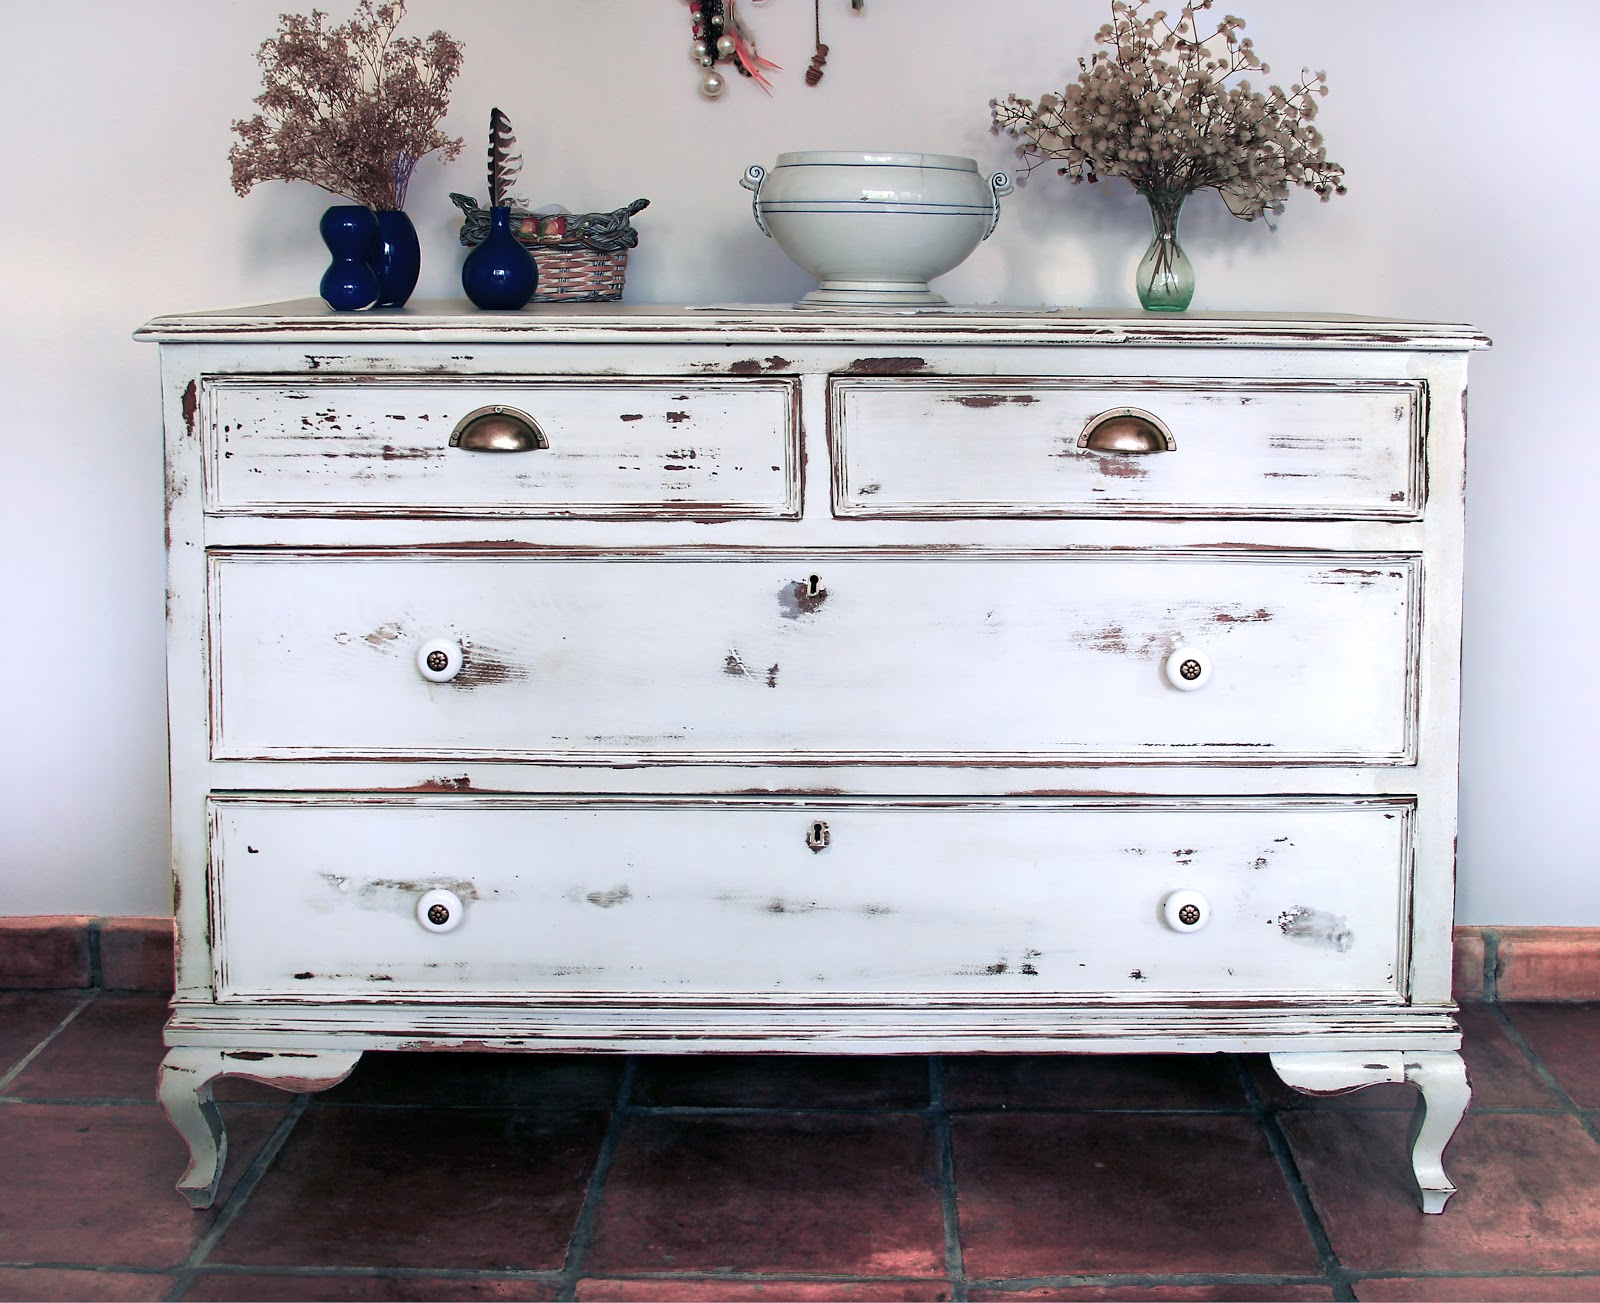 Dkp muebles shabby chic - Comodas originales ...